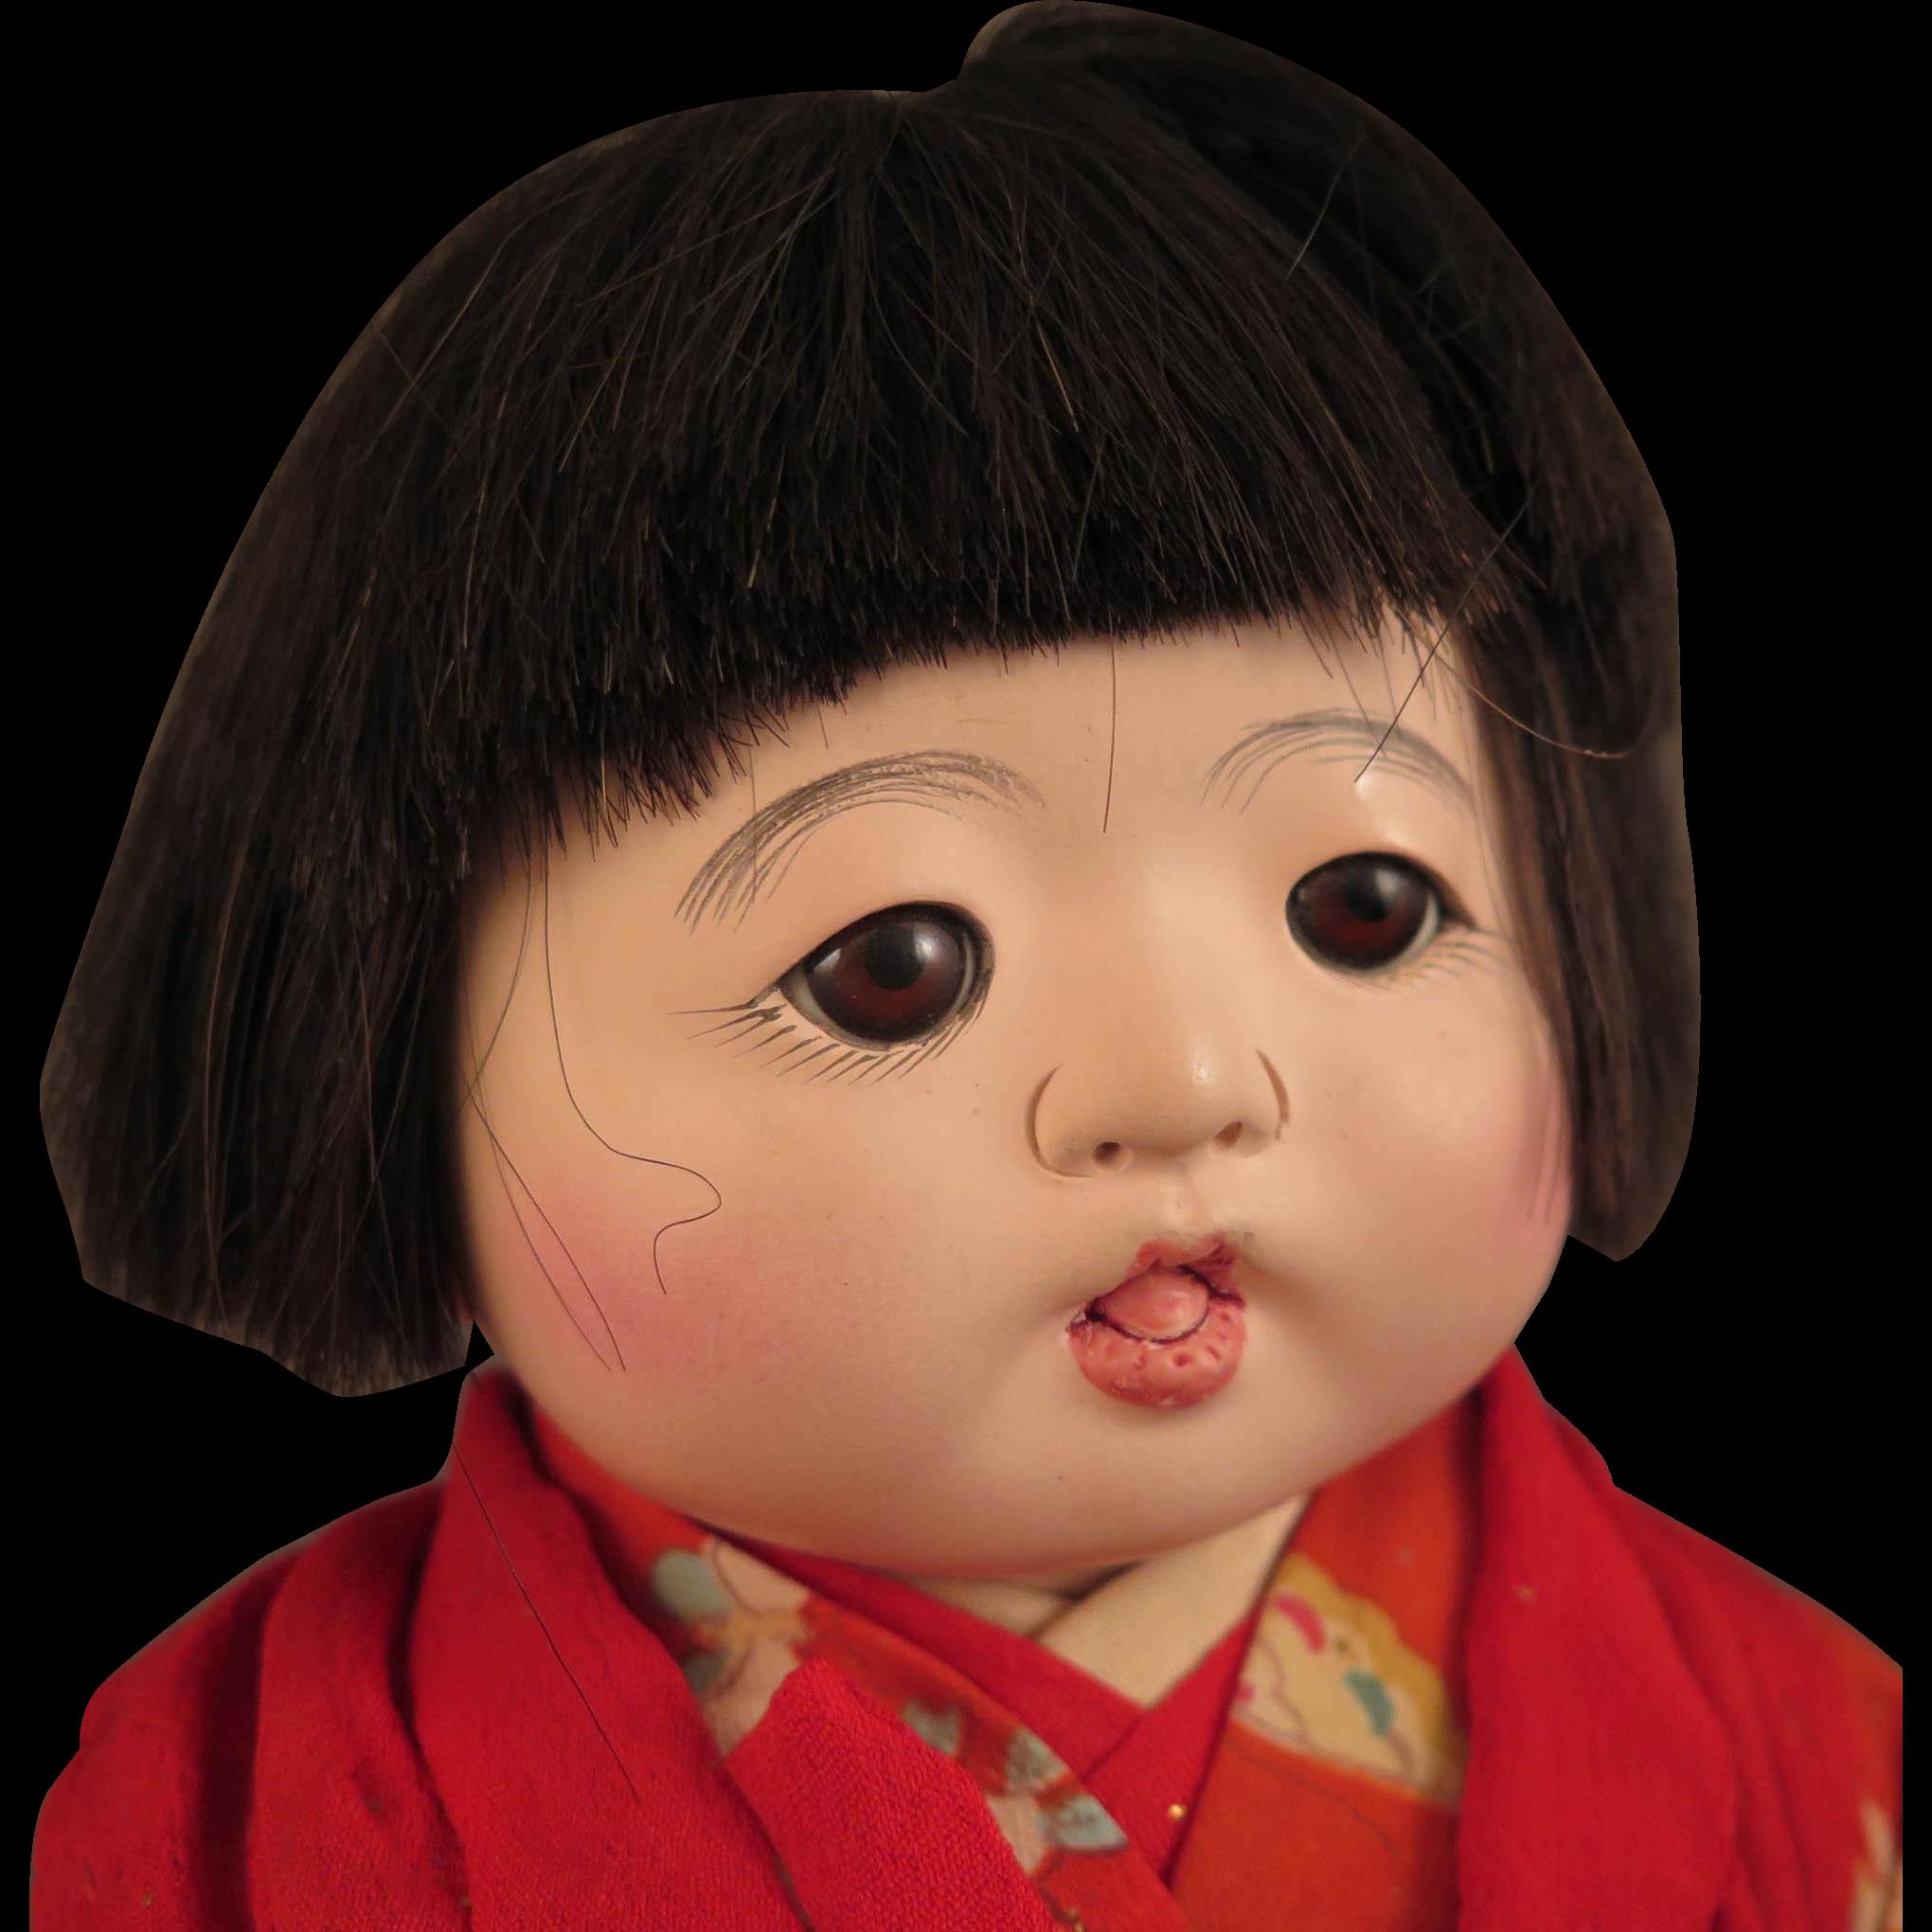 Vintage Japanese Gofun Baby Doll 13 inch